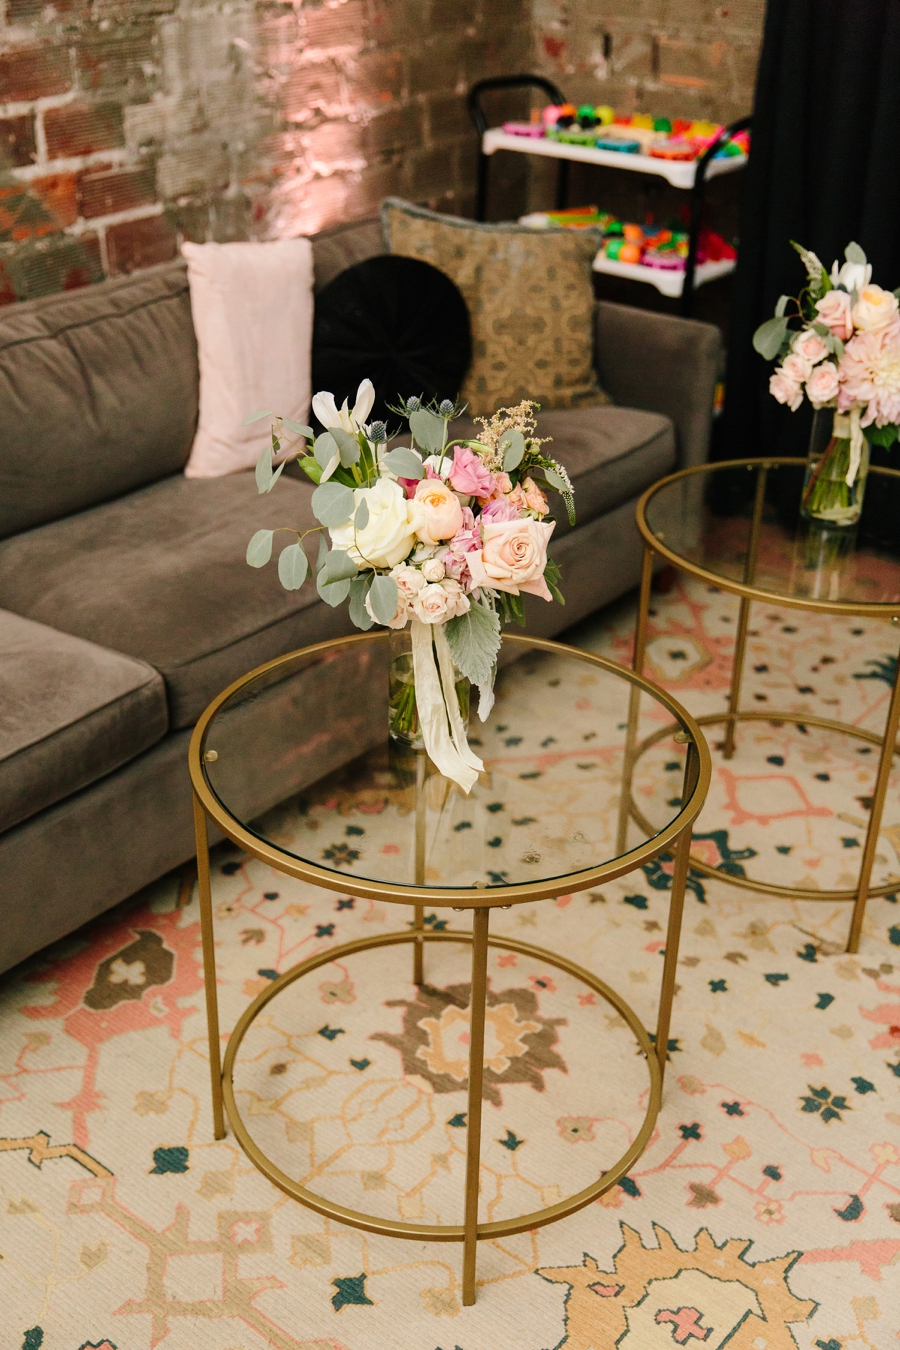 A Romantic Blush & Blue Tampa Wedding via TheELD.com A Romantic Blush & Blue Tampa Wedding - A Romantic Blush Blue Tampa Wedding 0047 - A Romantic Blush & Blue Tampa Wedding